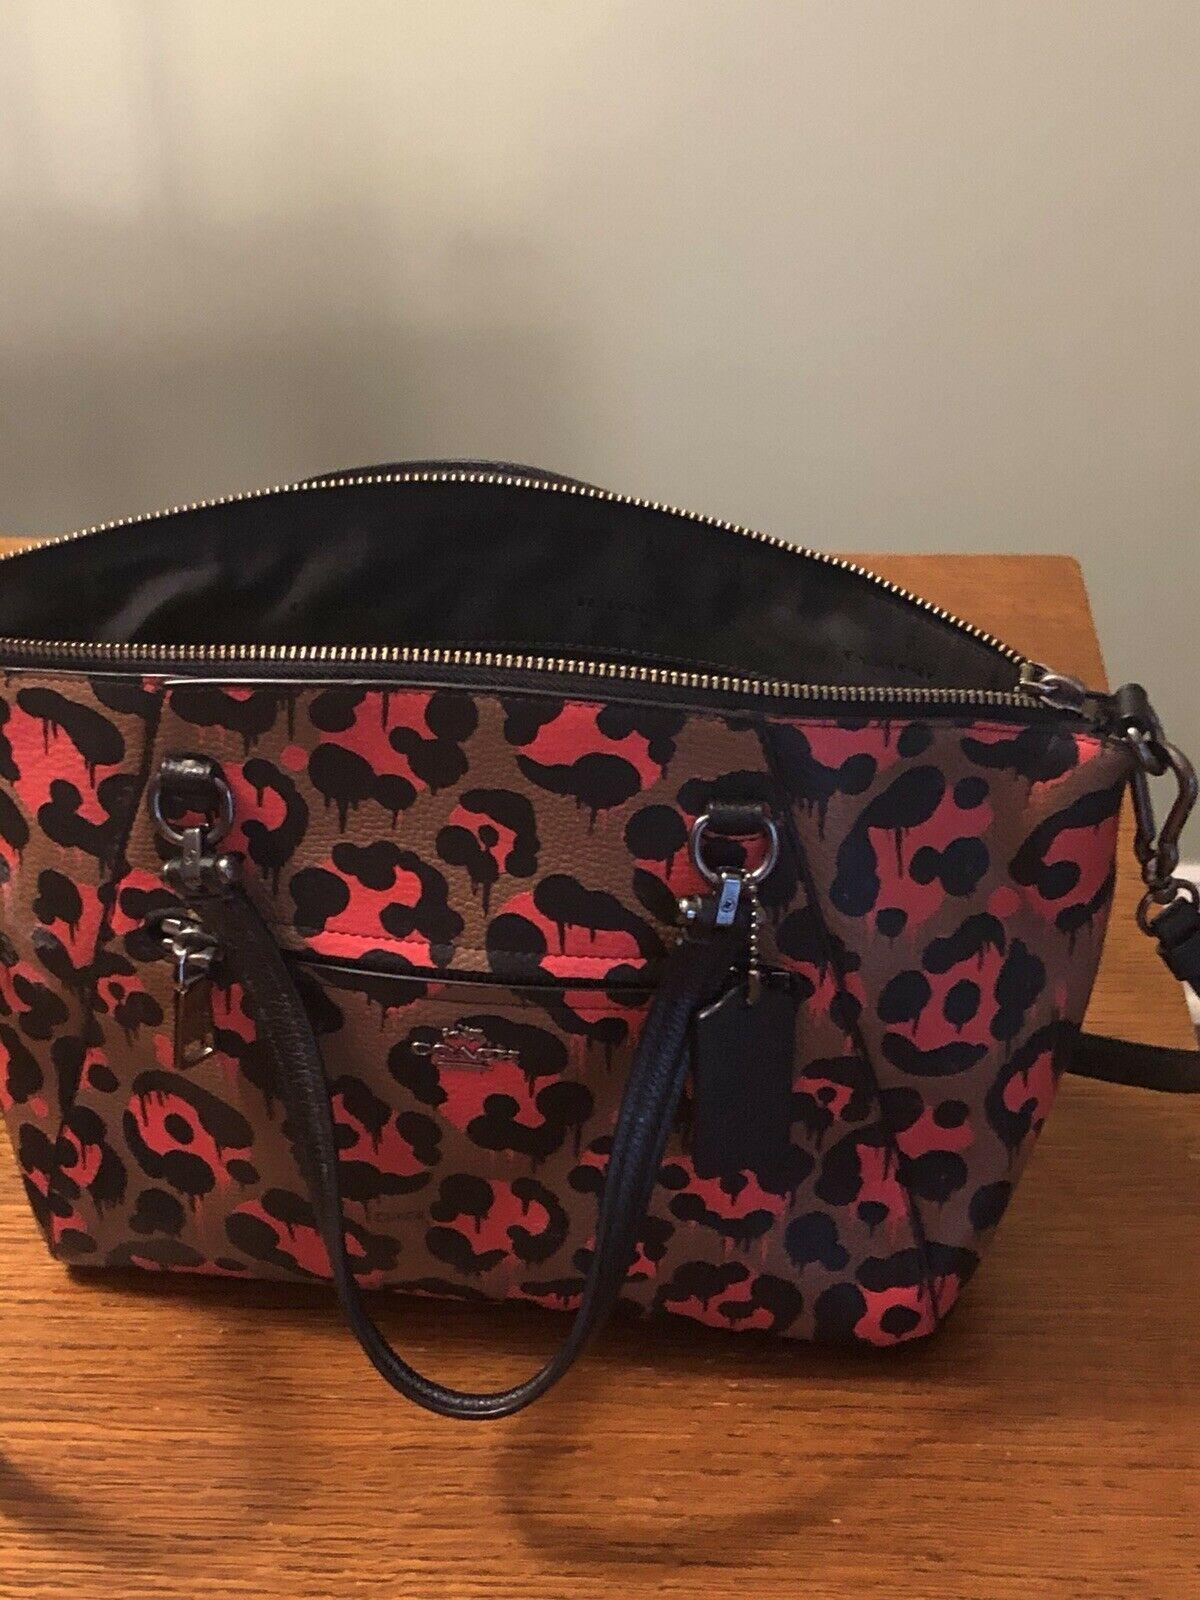 Coach Wild Beast Bag luxurybags coachbags